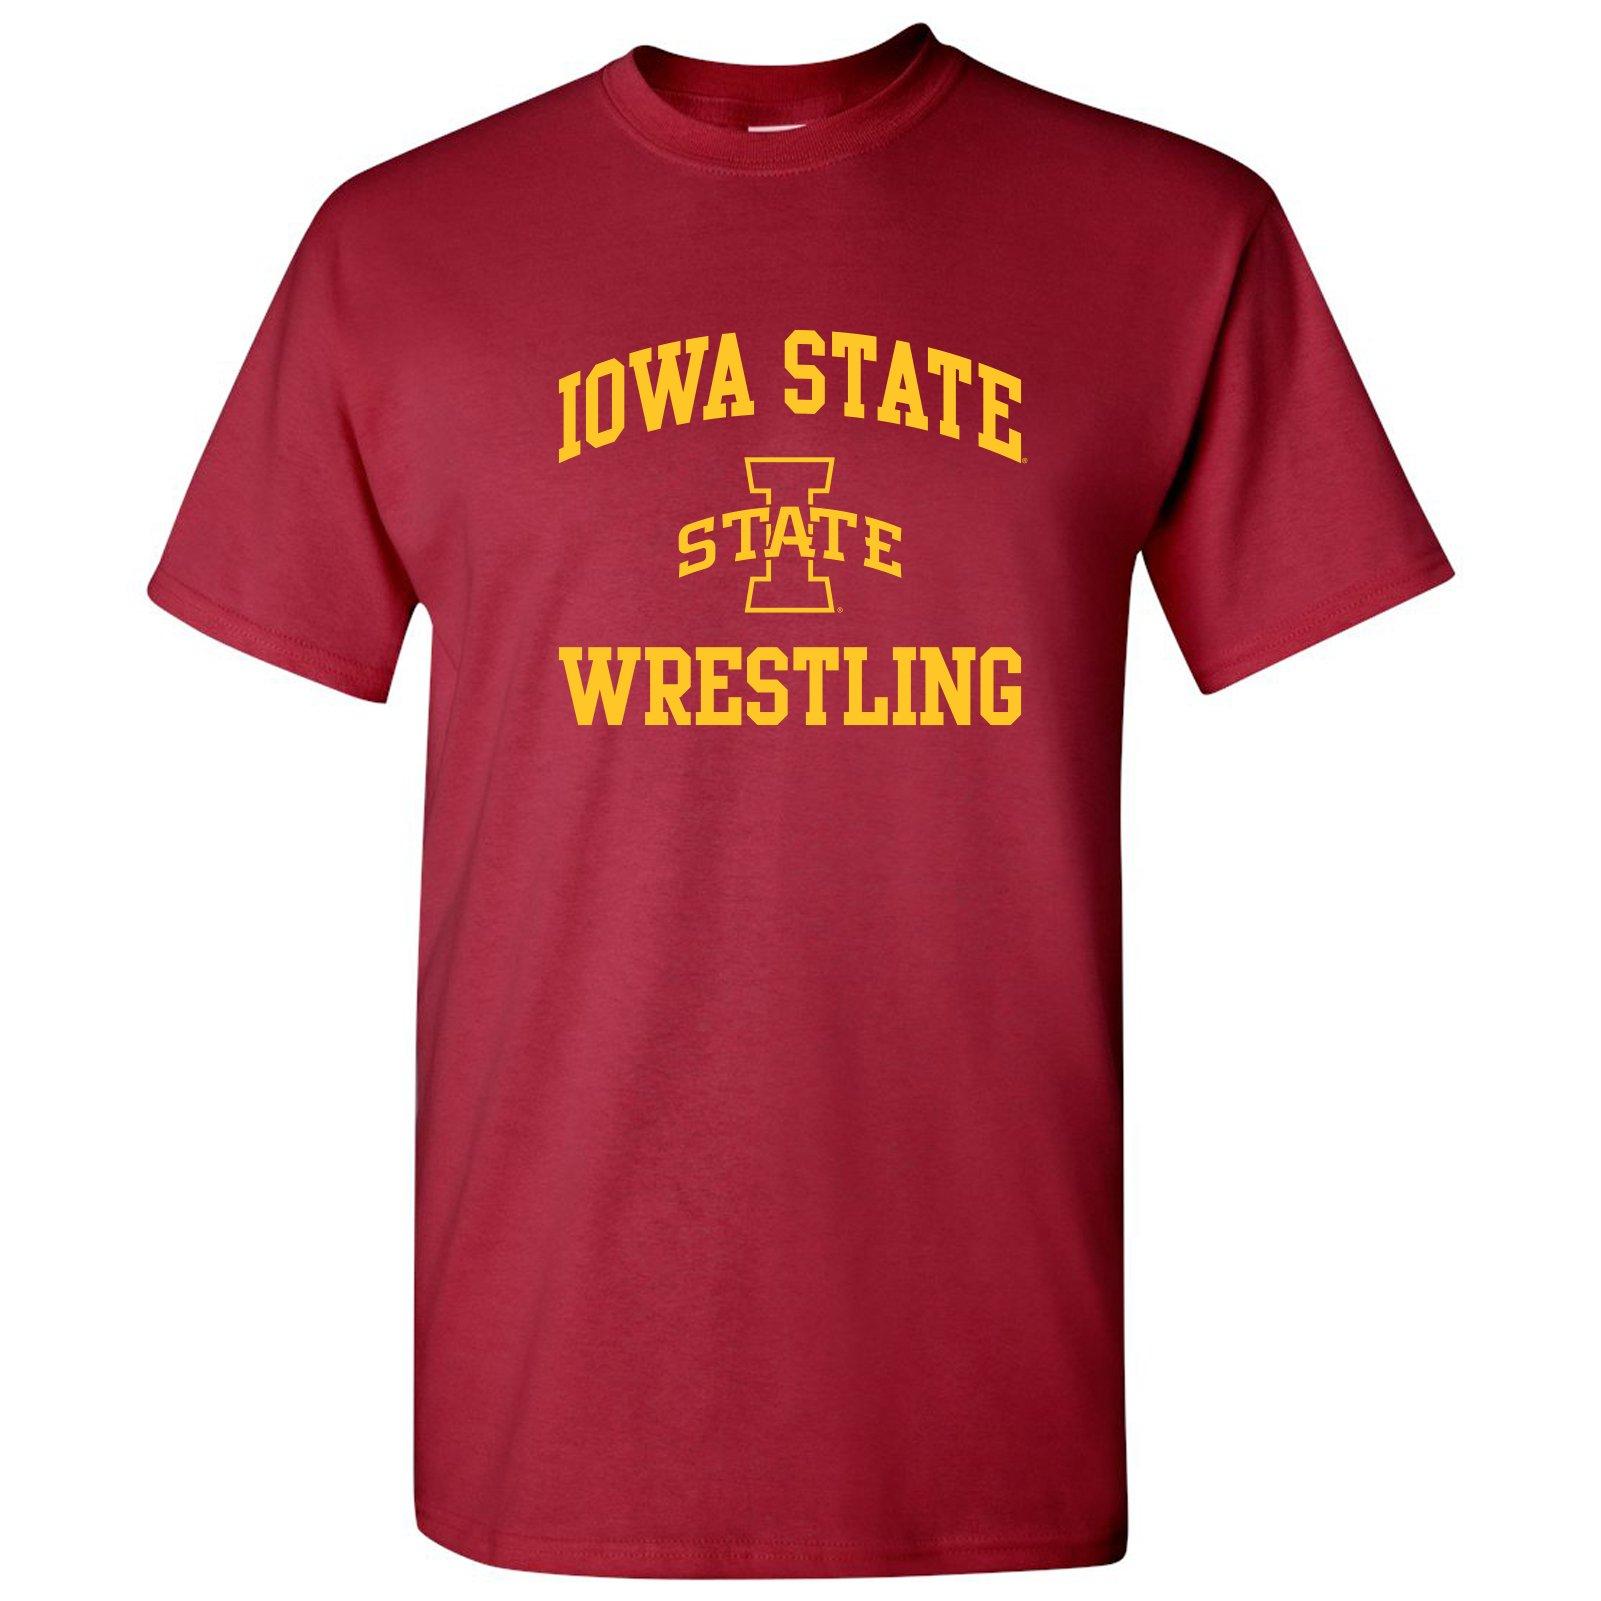 UGP Campus Apparel AS1104 - Iowa State Cyclones Arch Logo Wrestling T Shirt - Medium - Cardinal